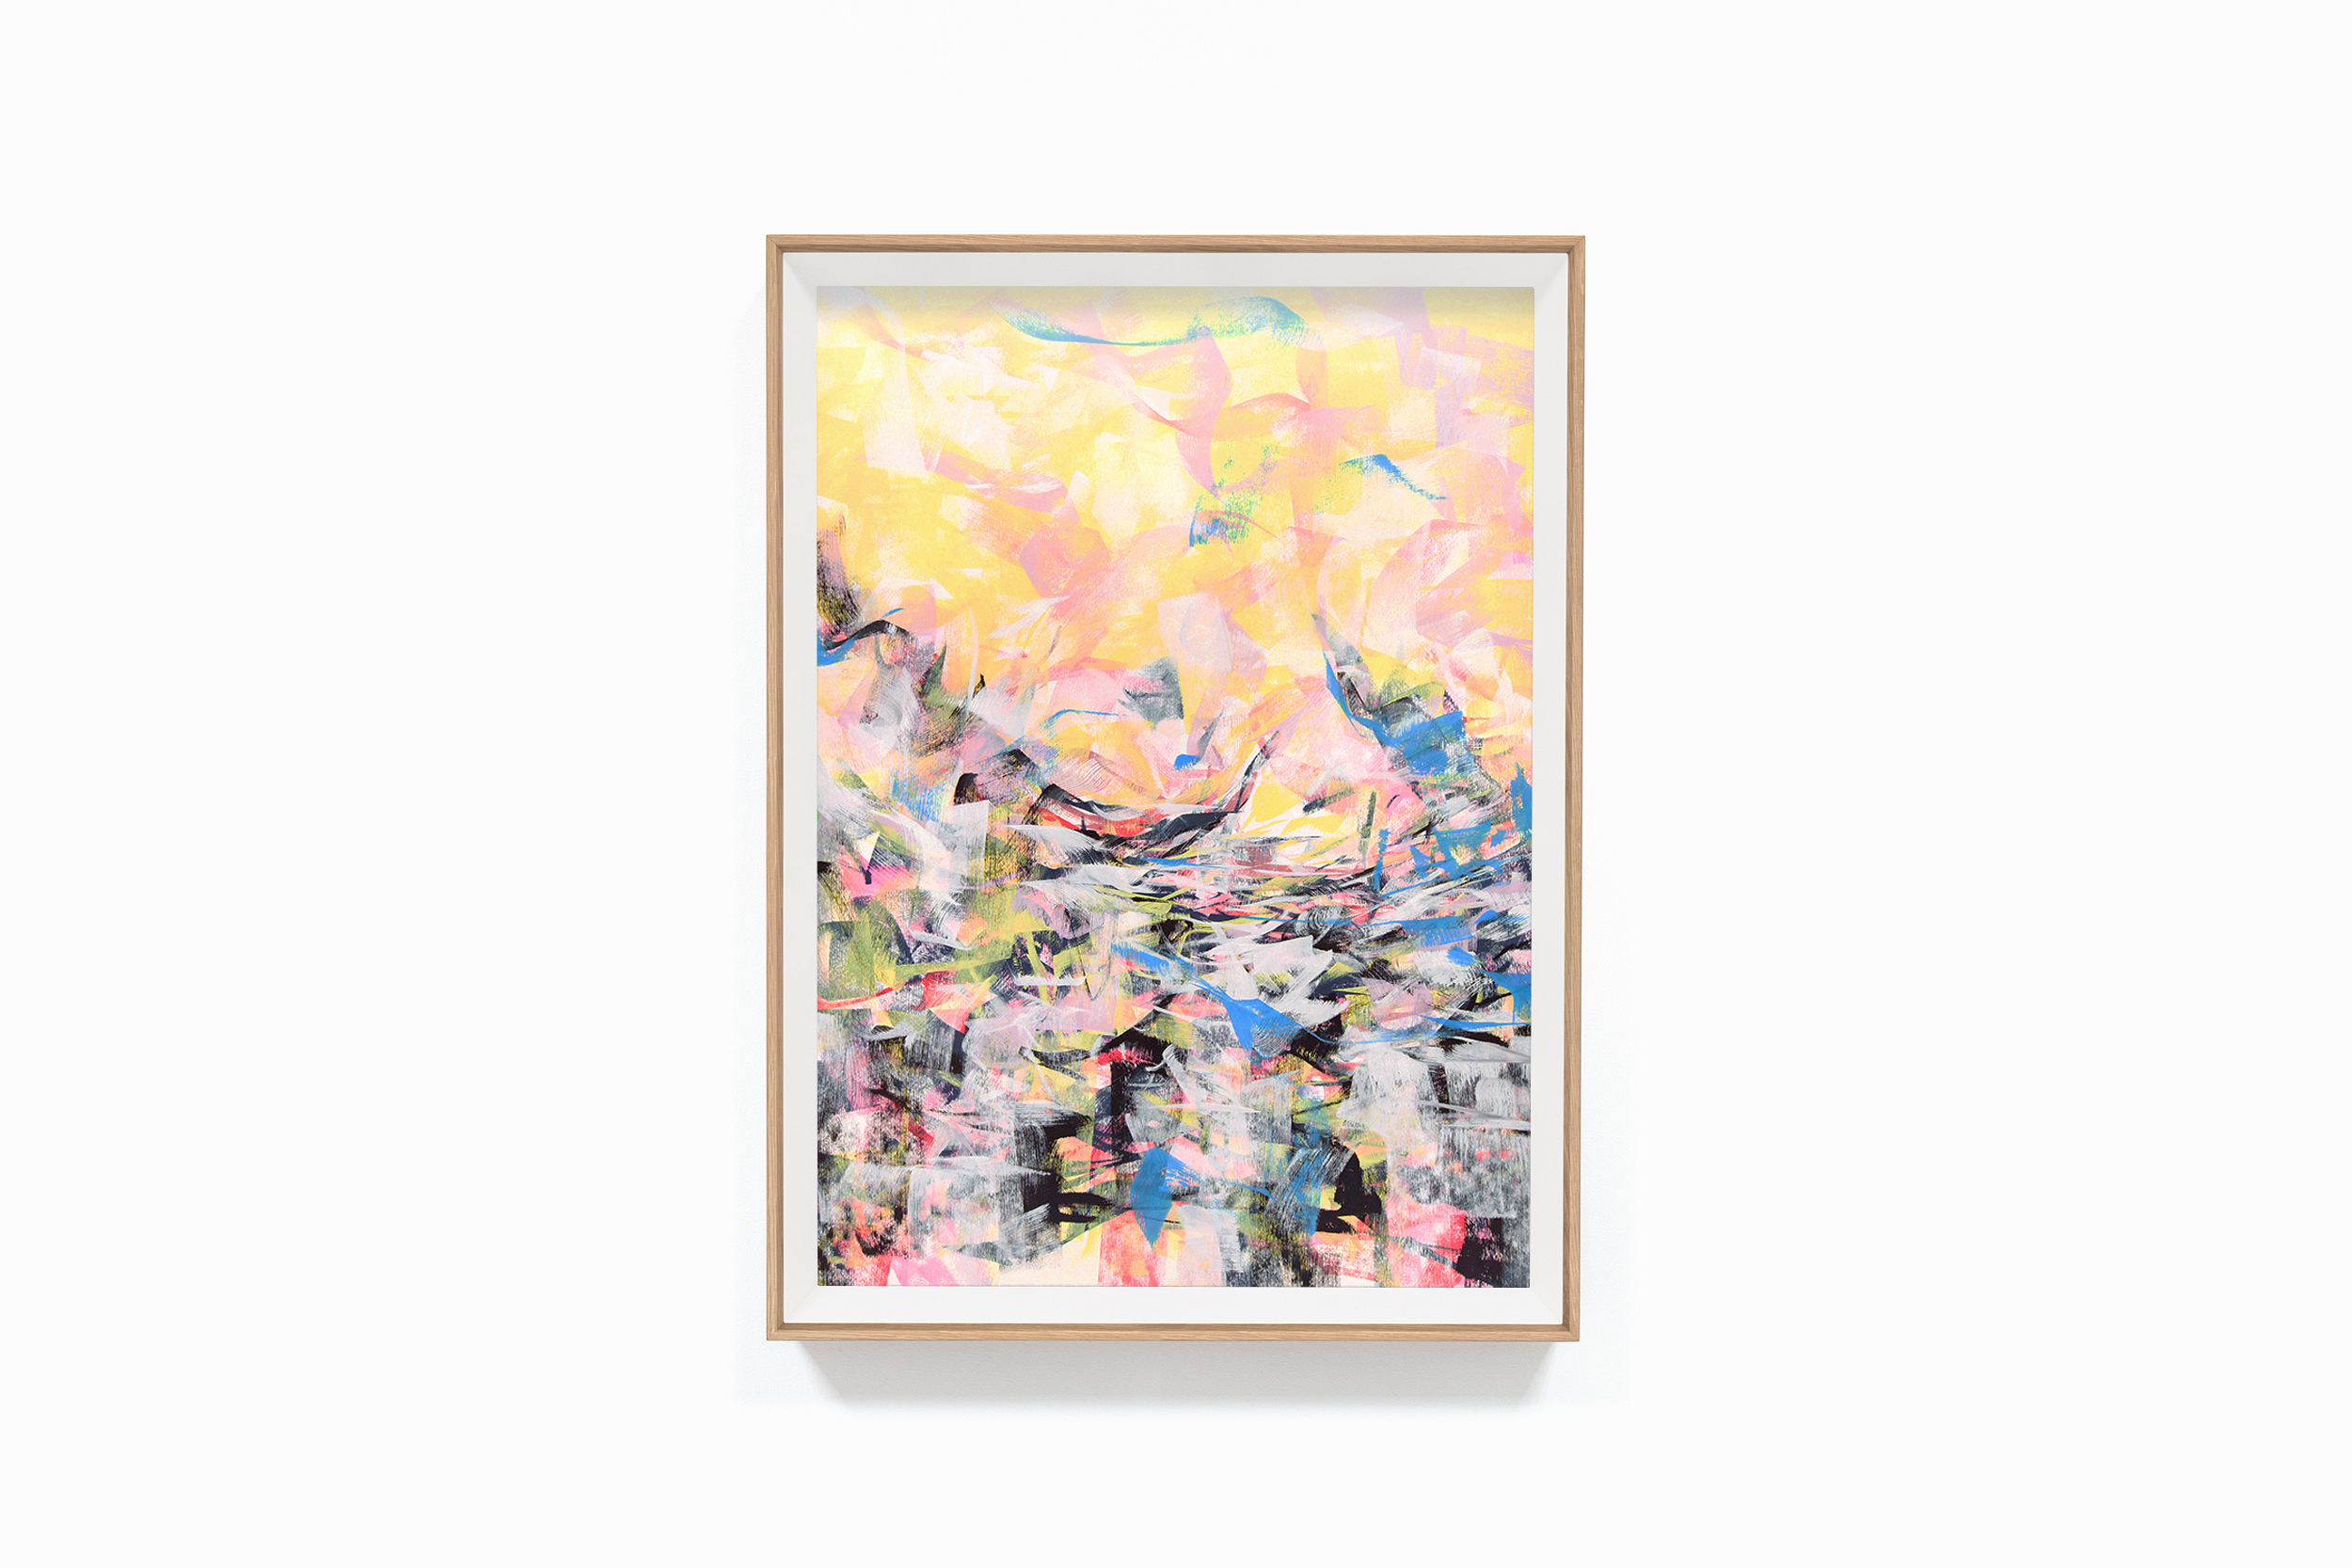 bonjourmolotov+Deambulaia+Exhibition+70x100+Illustration+Ilustracao+painting+pintura+acrylic+acrílico+canvas+tela+paper+cardboard+mdf+Andre+Gigante+08N27_E.jpg